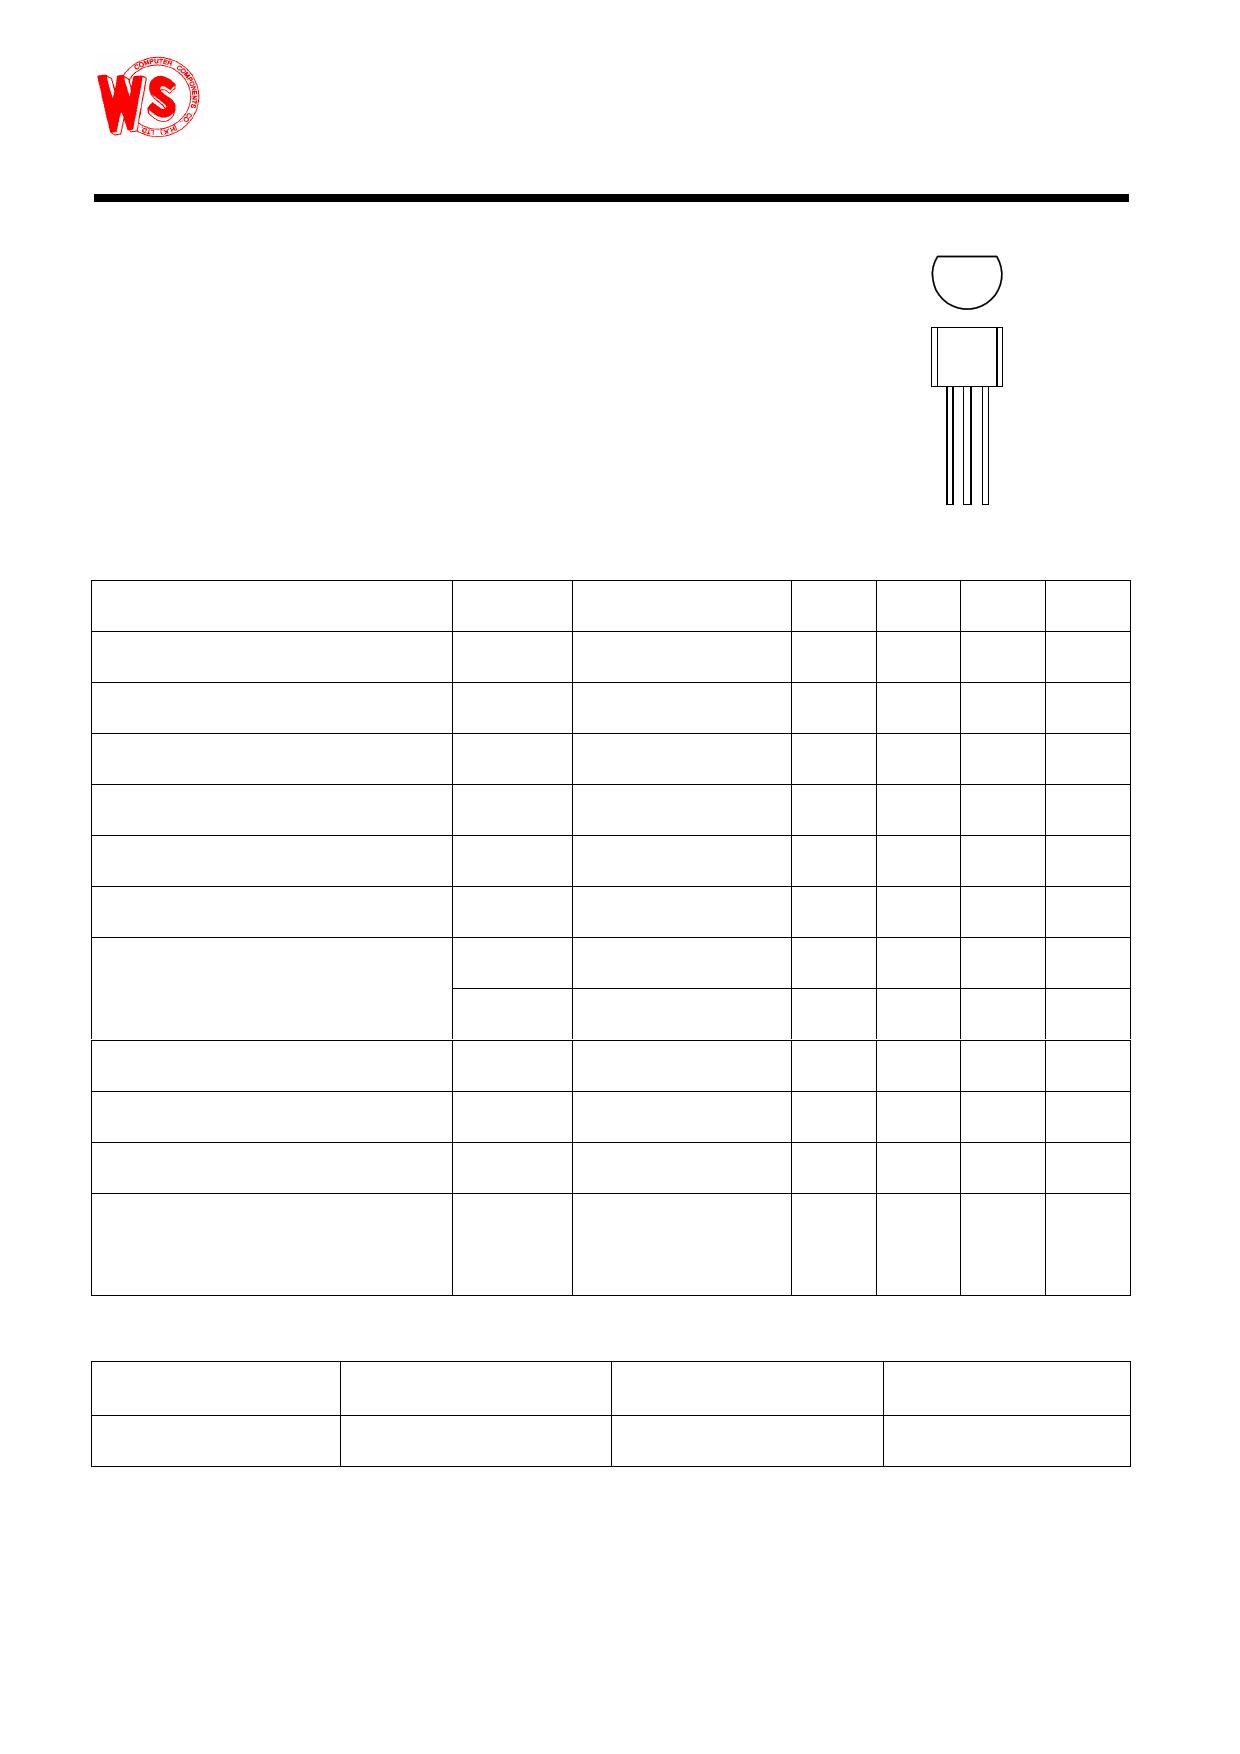 S8550 datasheet pinout